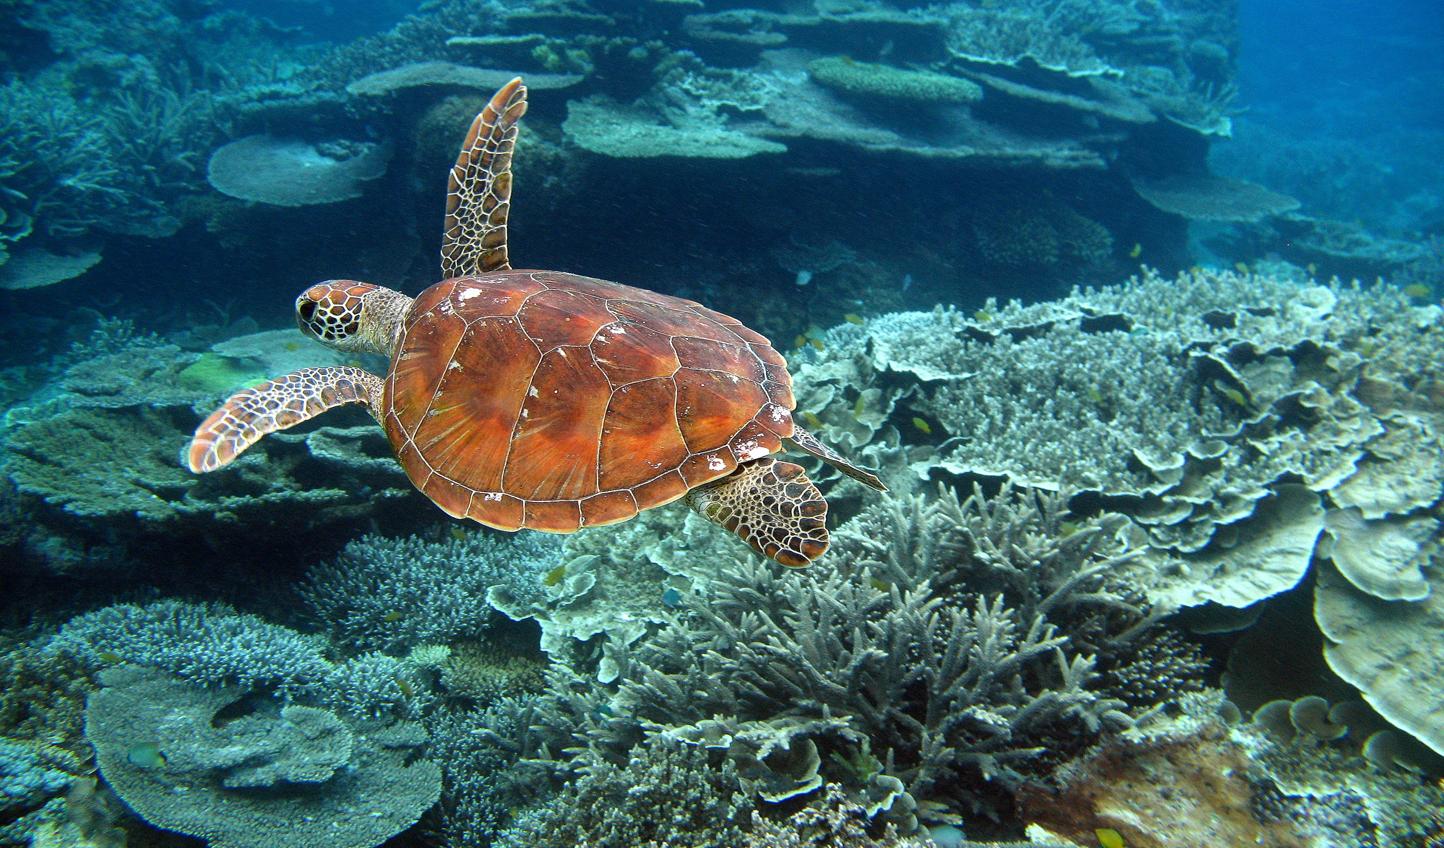 Swim with turtles in Australia